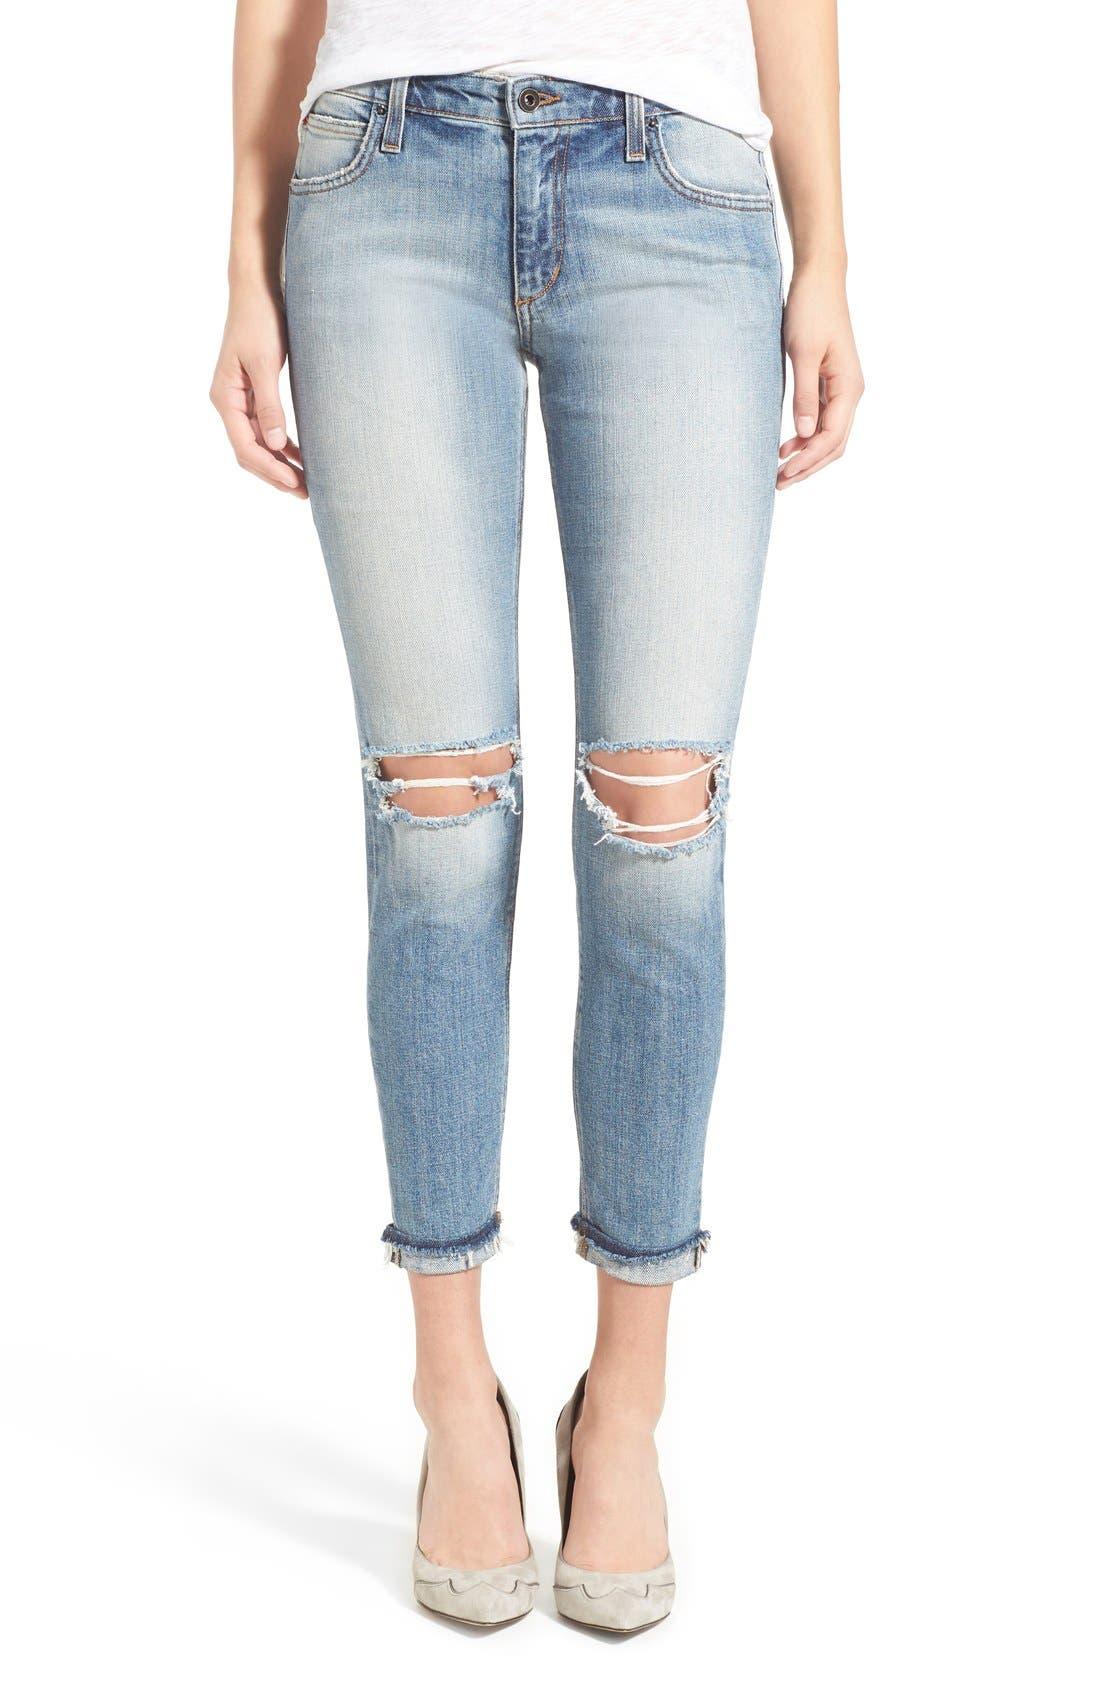 Alternate Image 1 Selected - Joe's 'Collector's - Billie' Ankle Slim Boyfriend Jeans (Blakely)